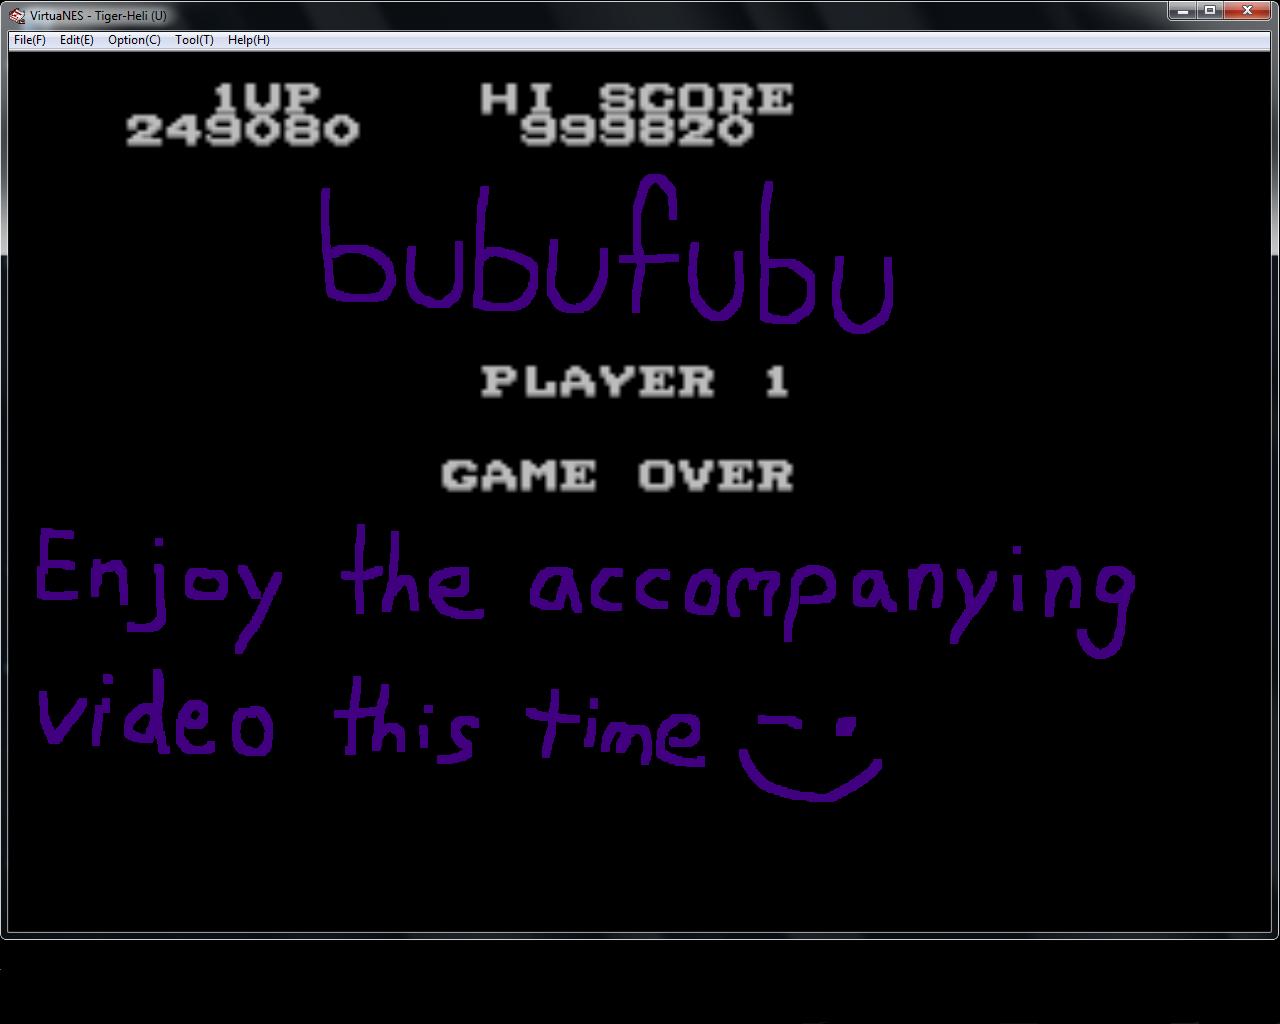 bubufubu: Tiger-Heli (NES/Famicom Emulated) 1,249,080 points on 2015-01-27 14:25:34